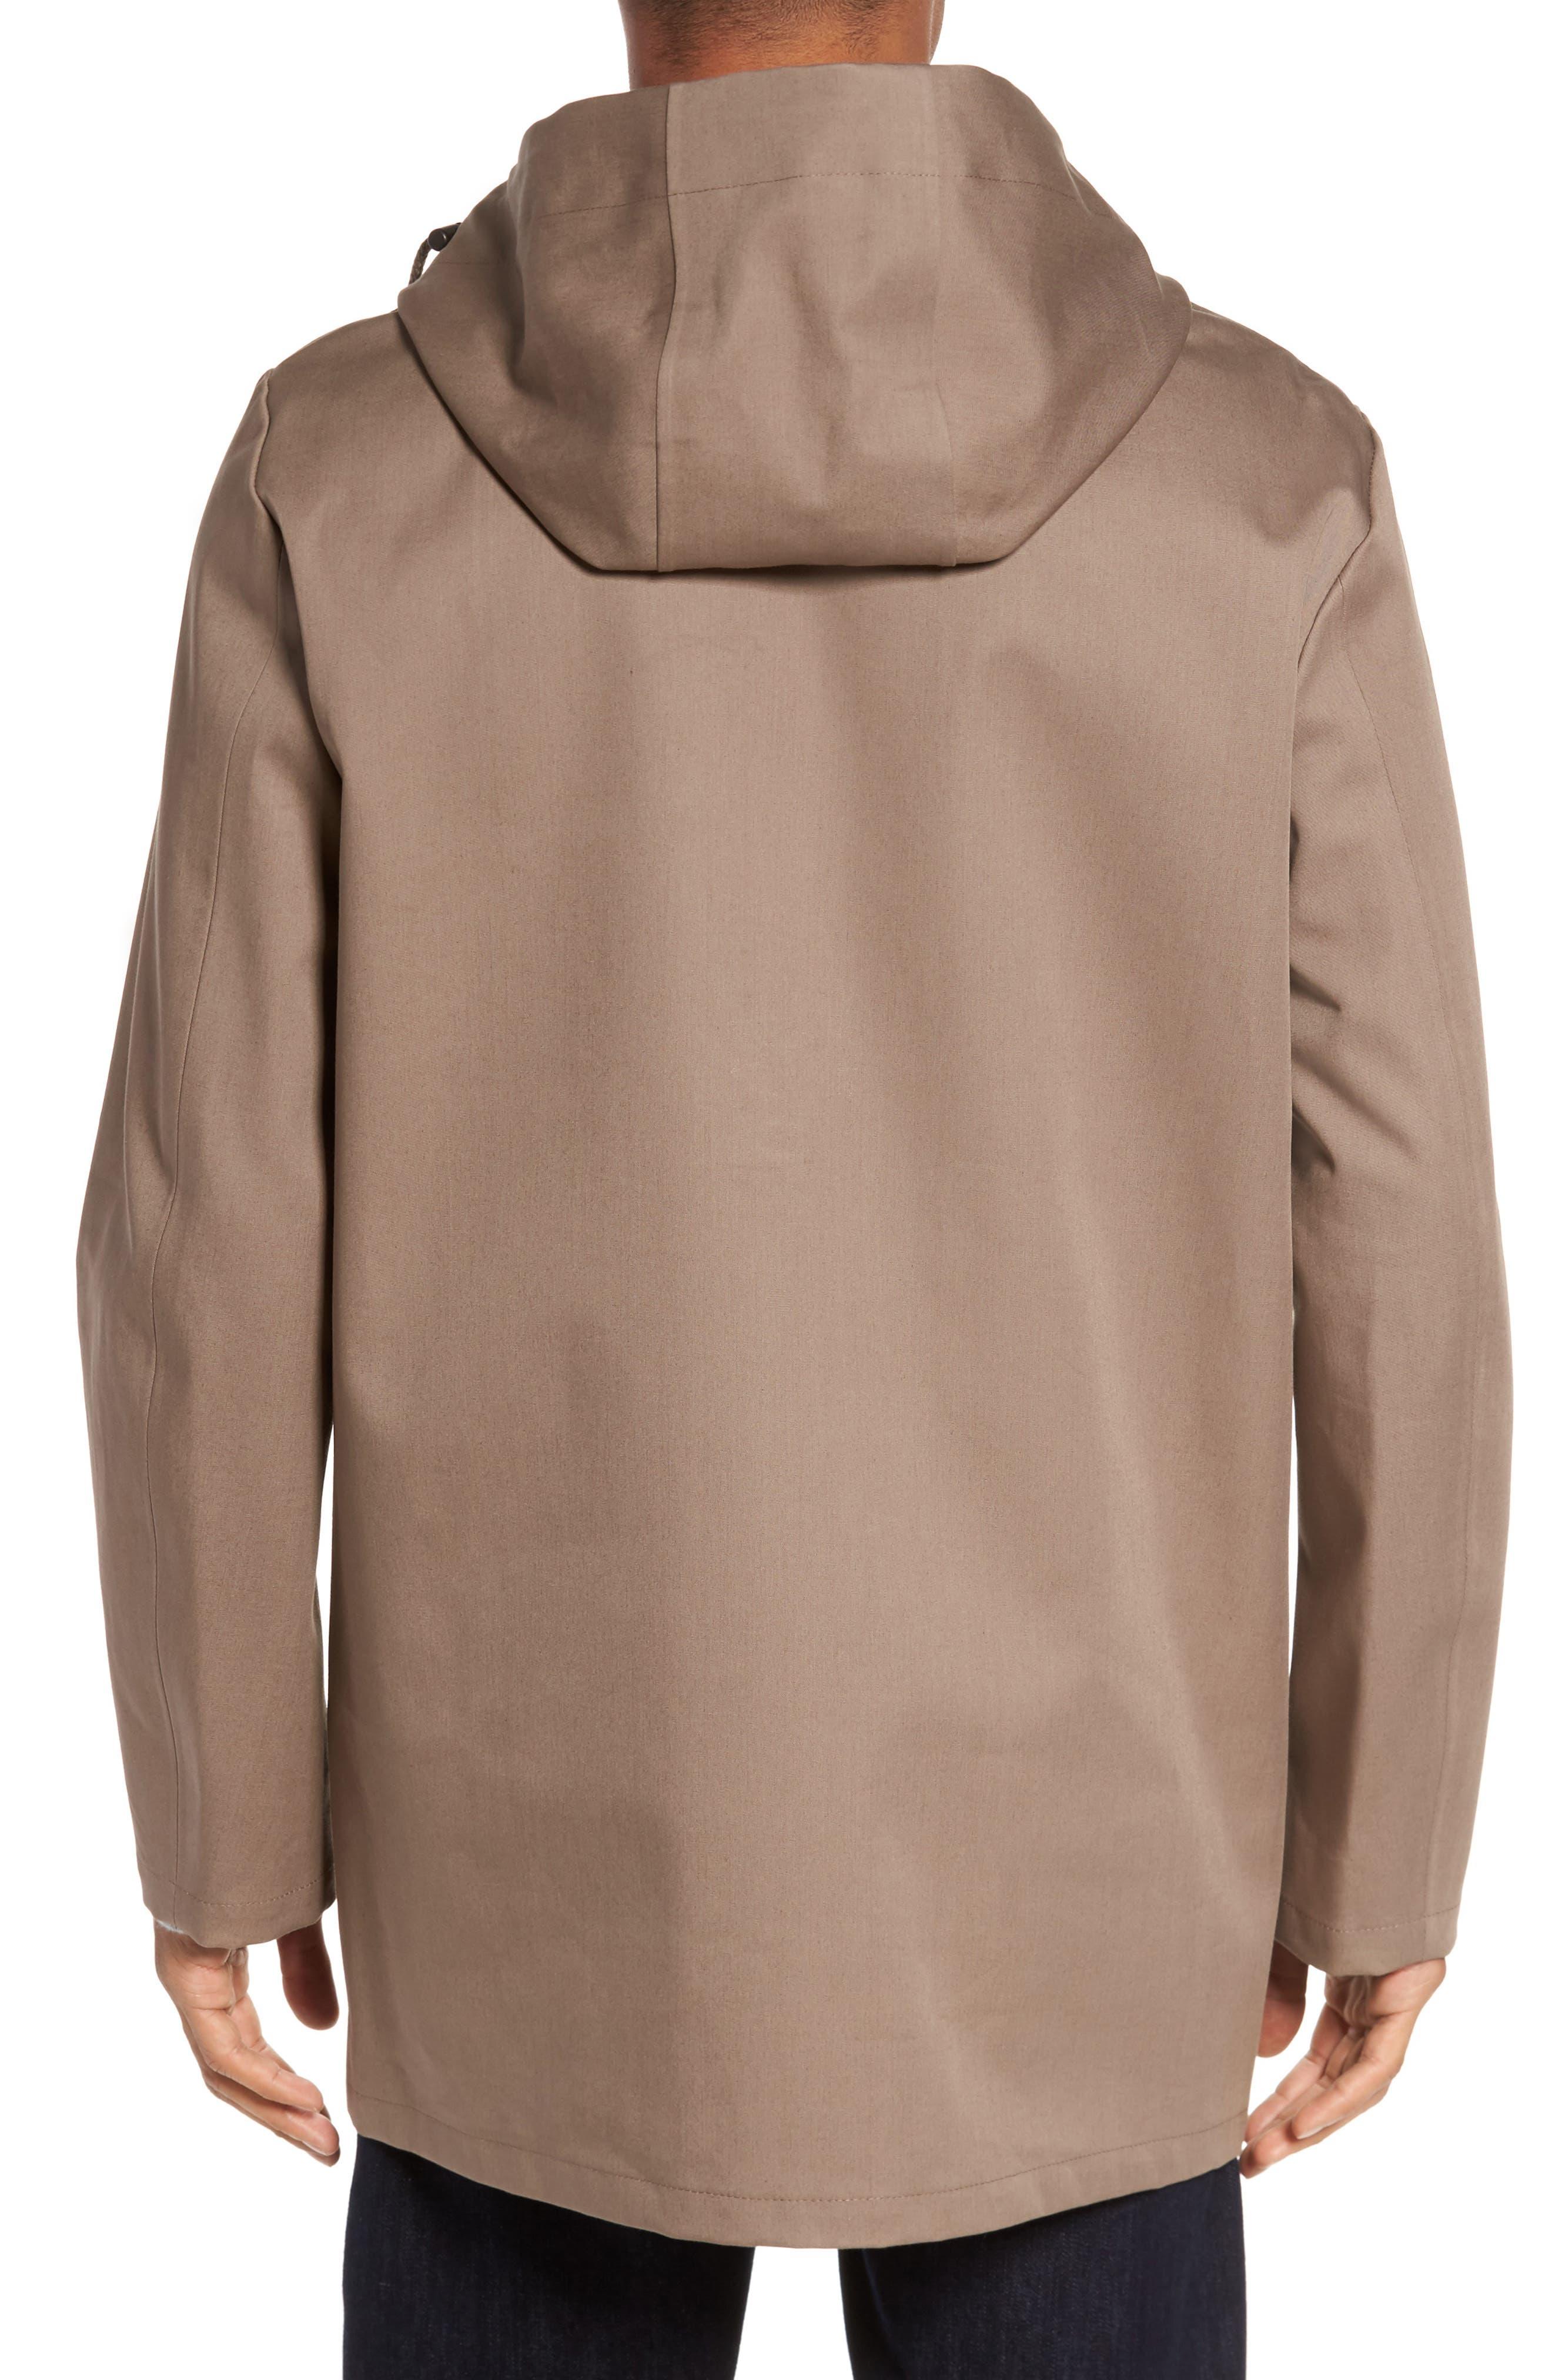 Stockholm Bonded Waterproof Hooded Raincoat,                             Alternate thumbnail 2, color,                             Mole